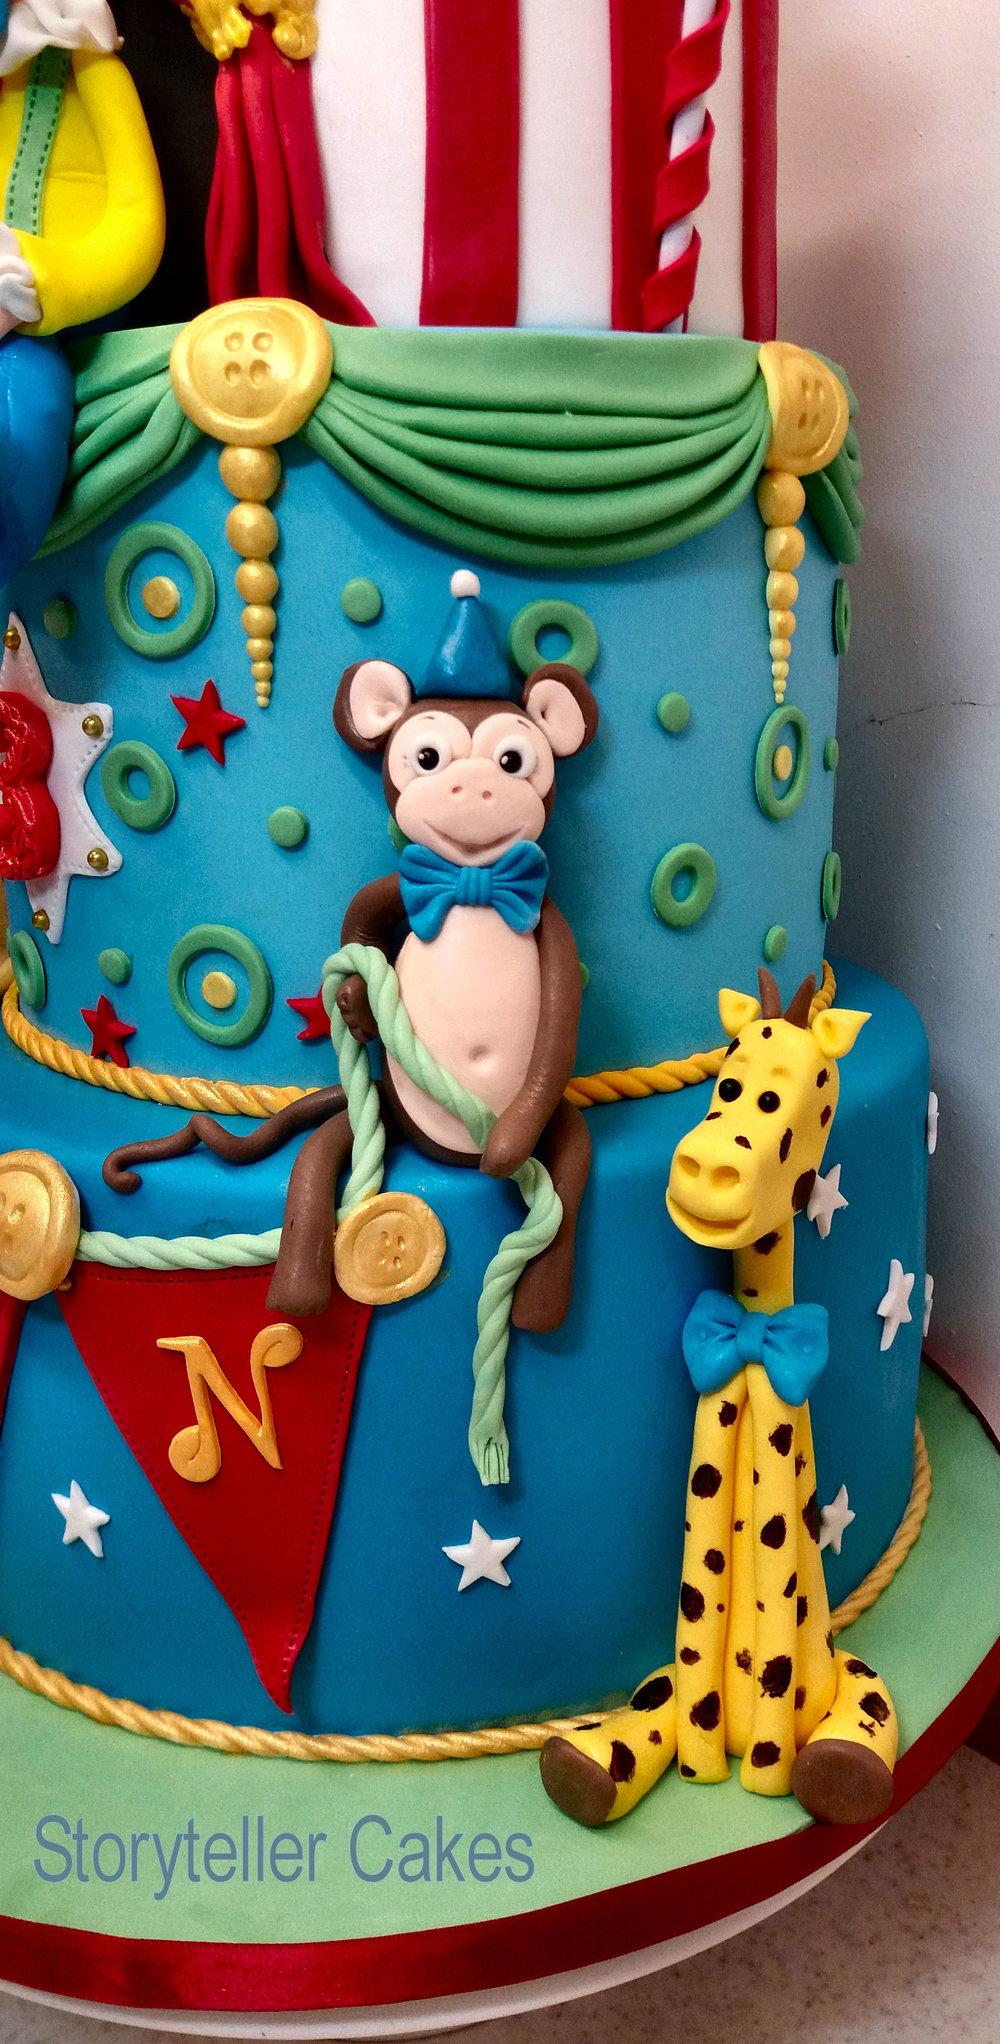 Circus Cake 4.jpg